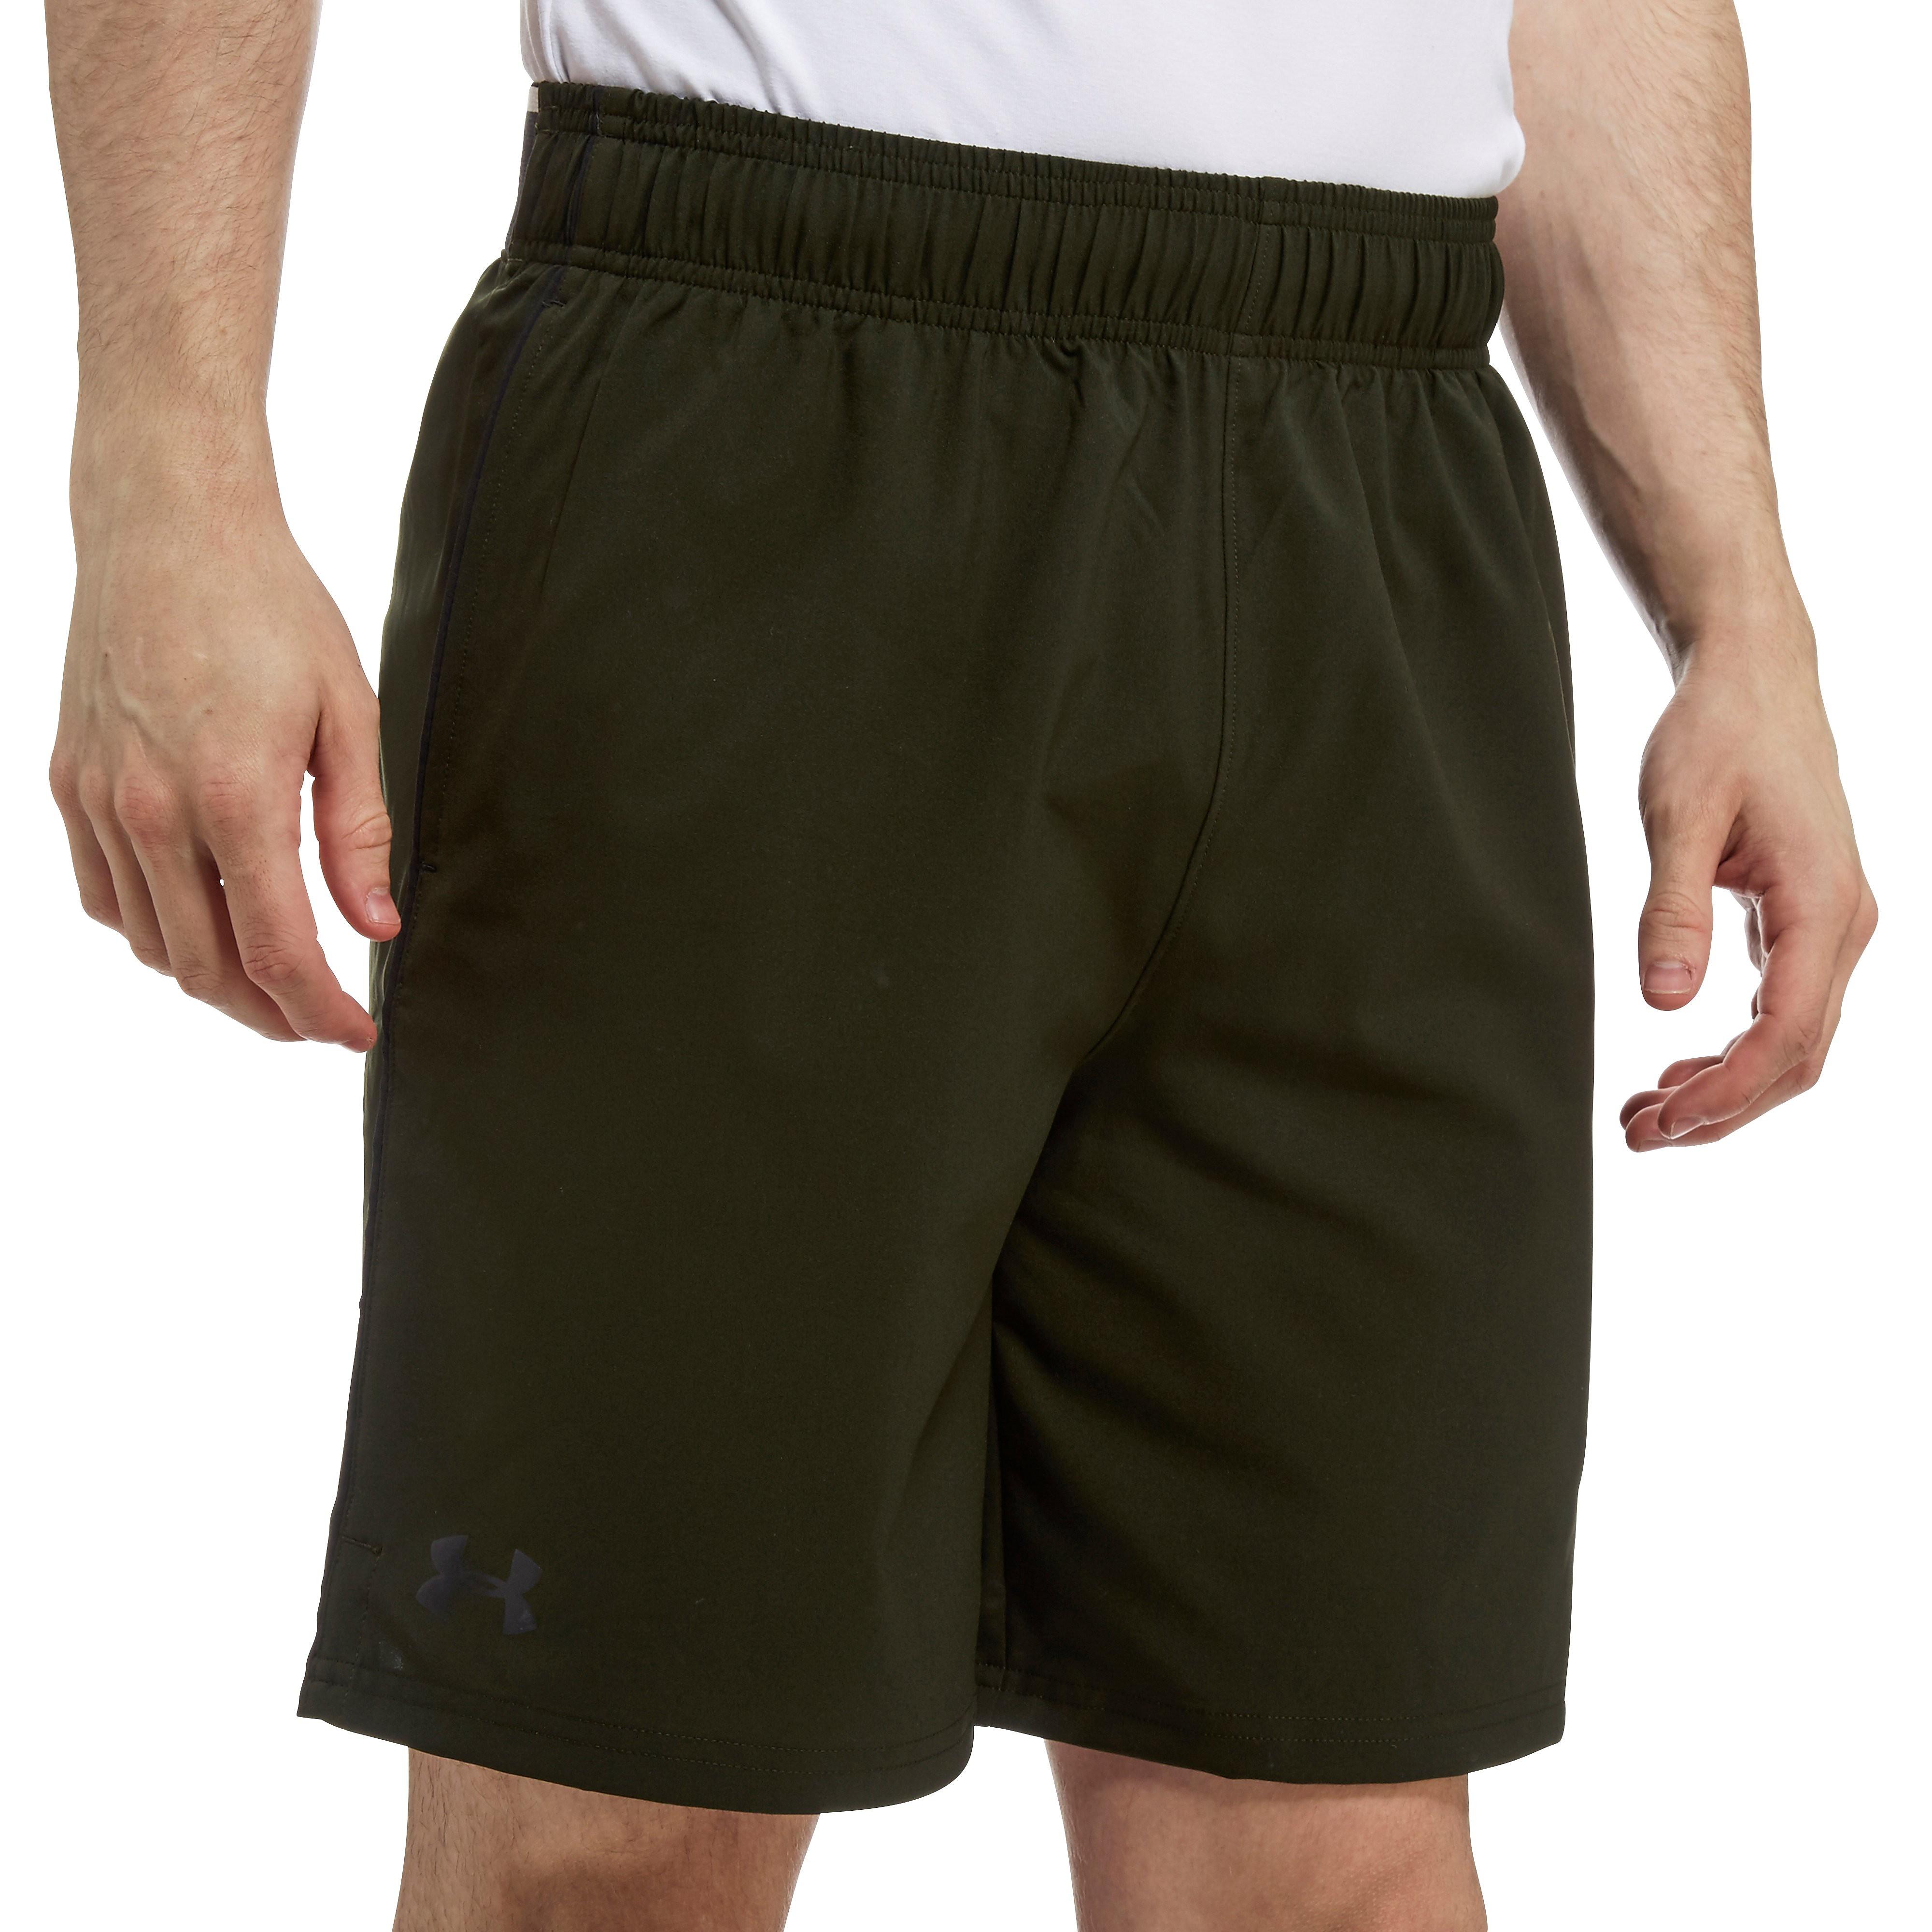 Under Armour Mirage Men's Shorts